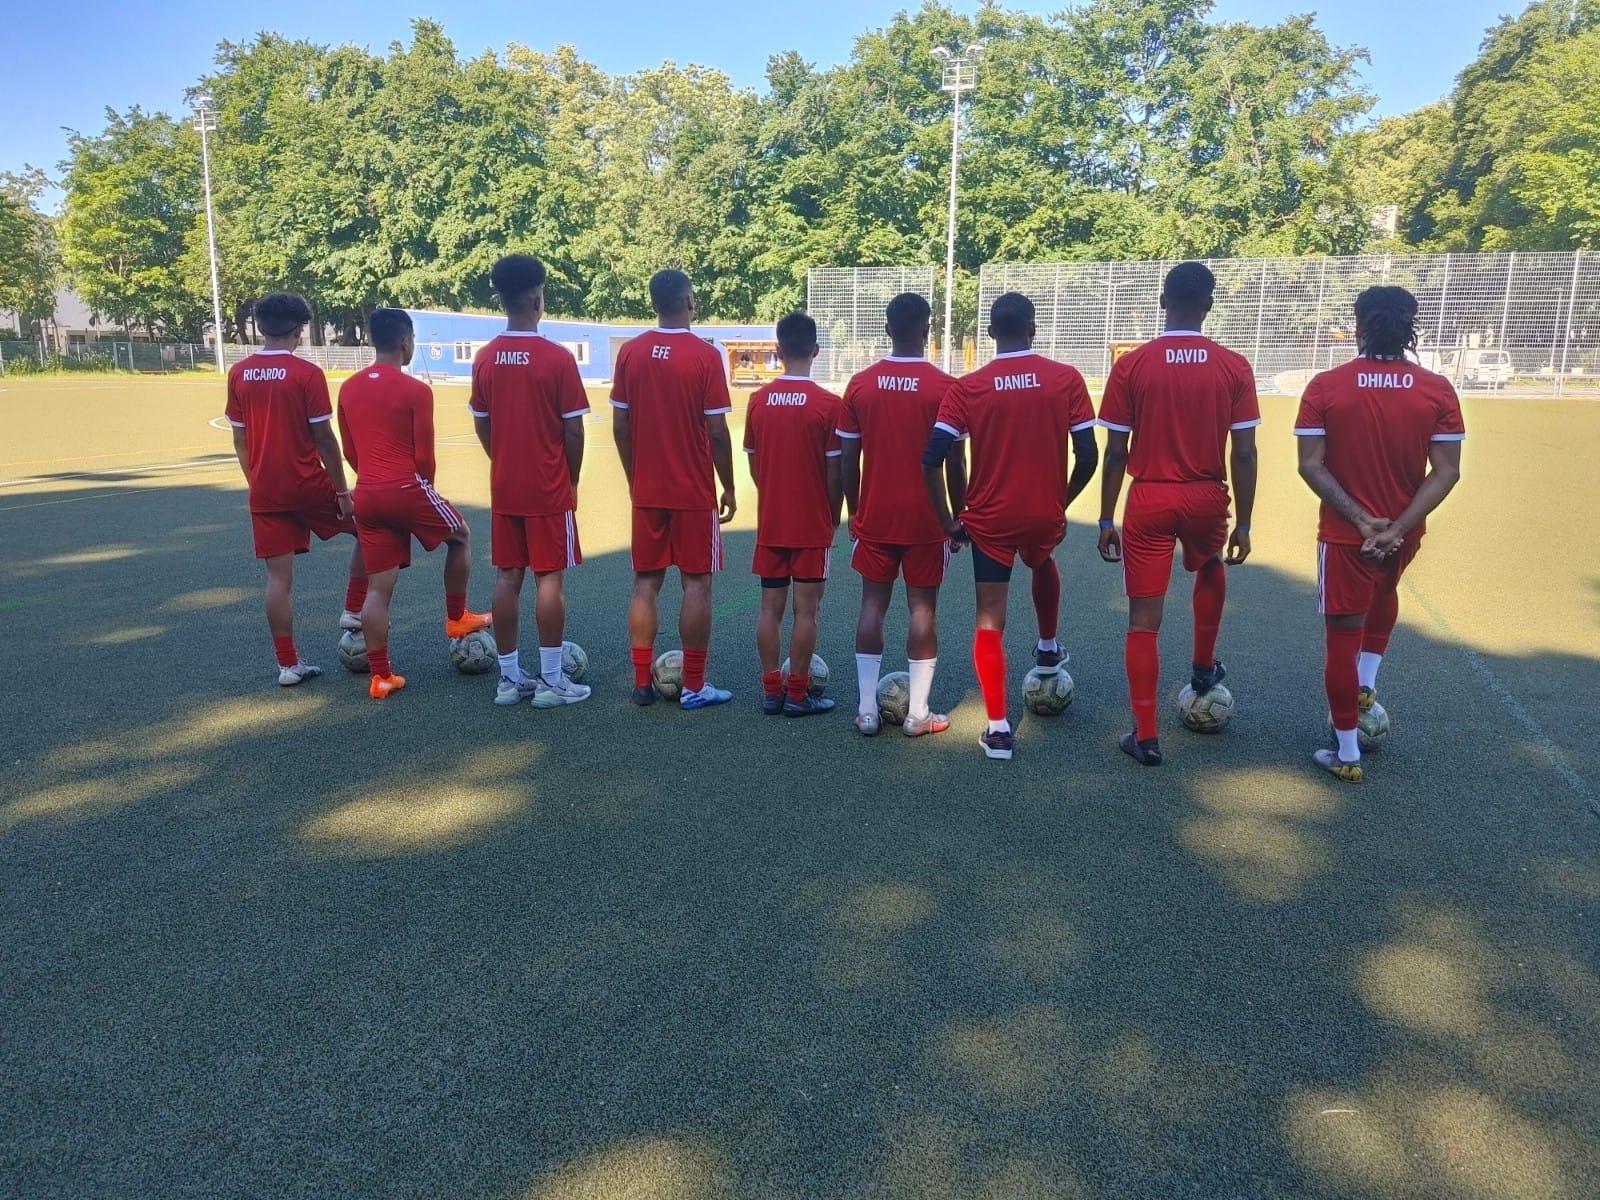 Munich Football School Munich Germany - 2